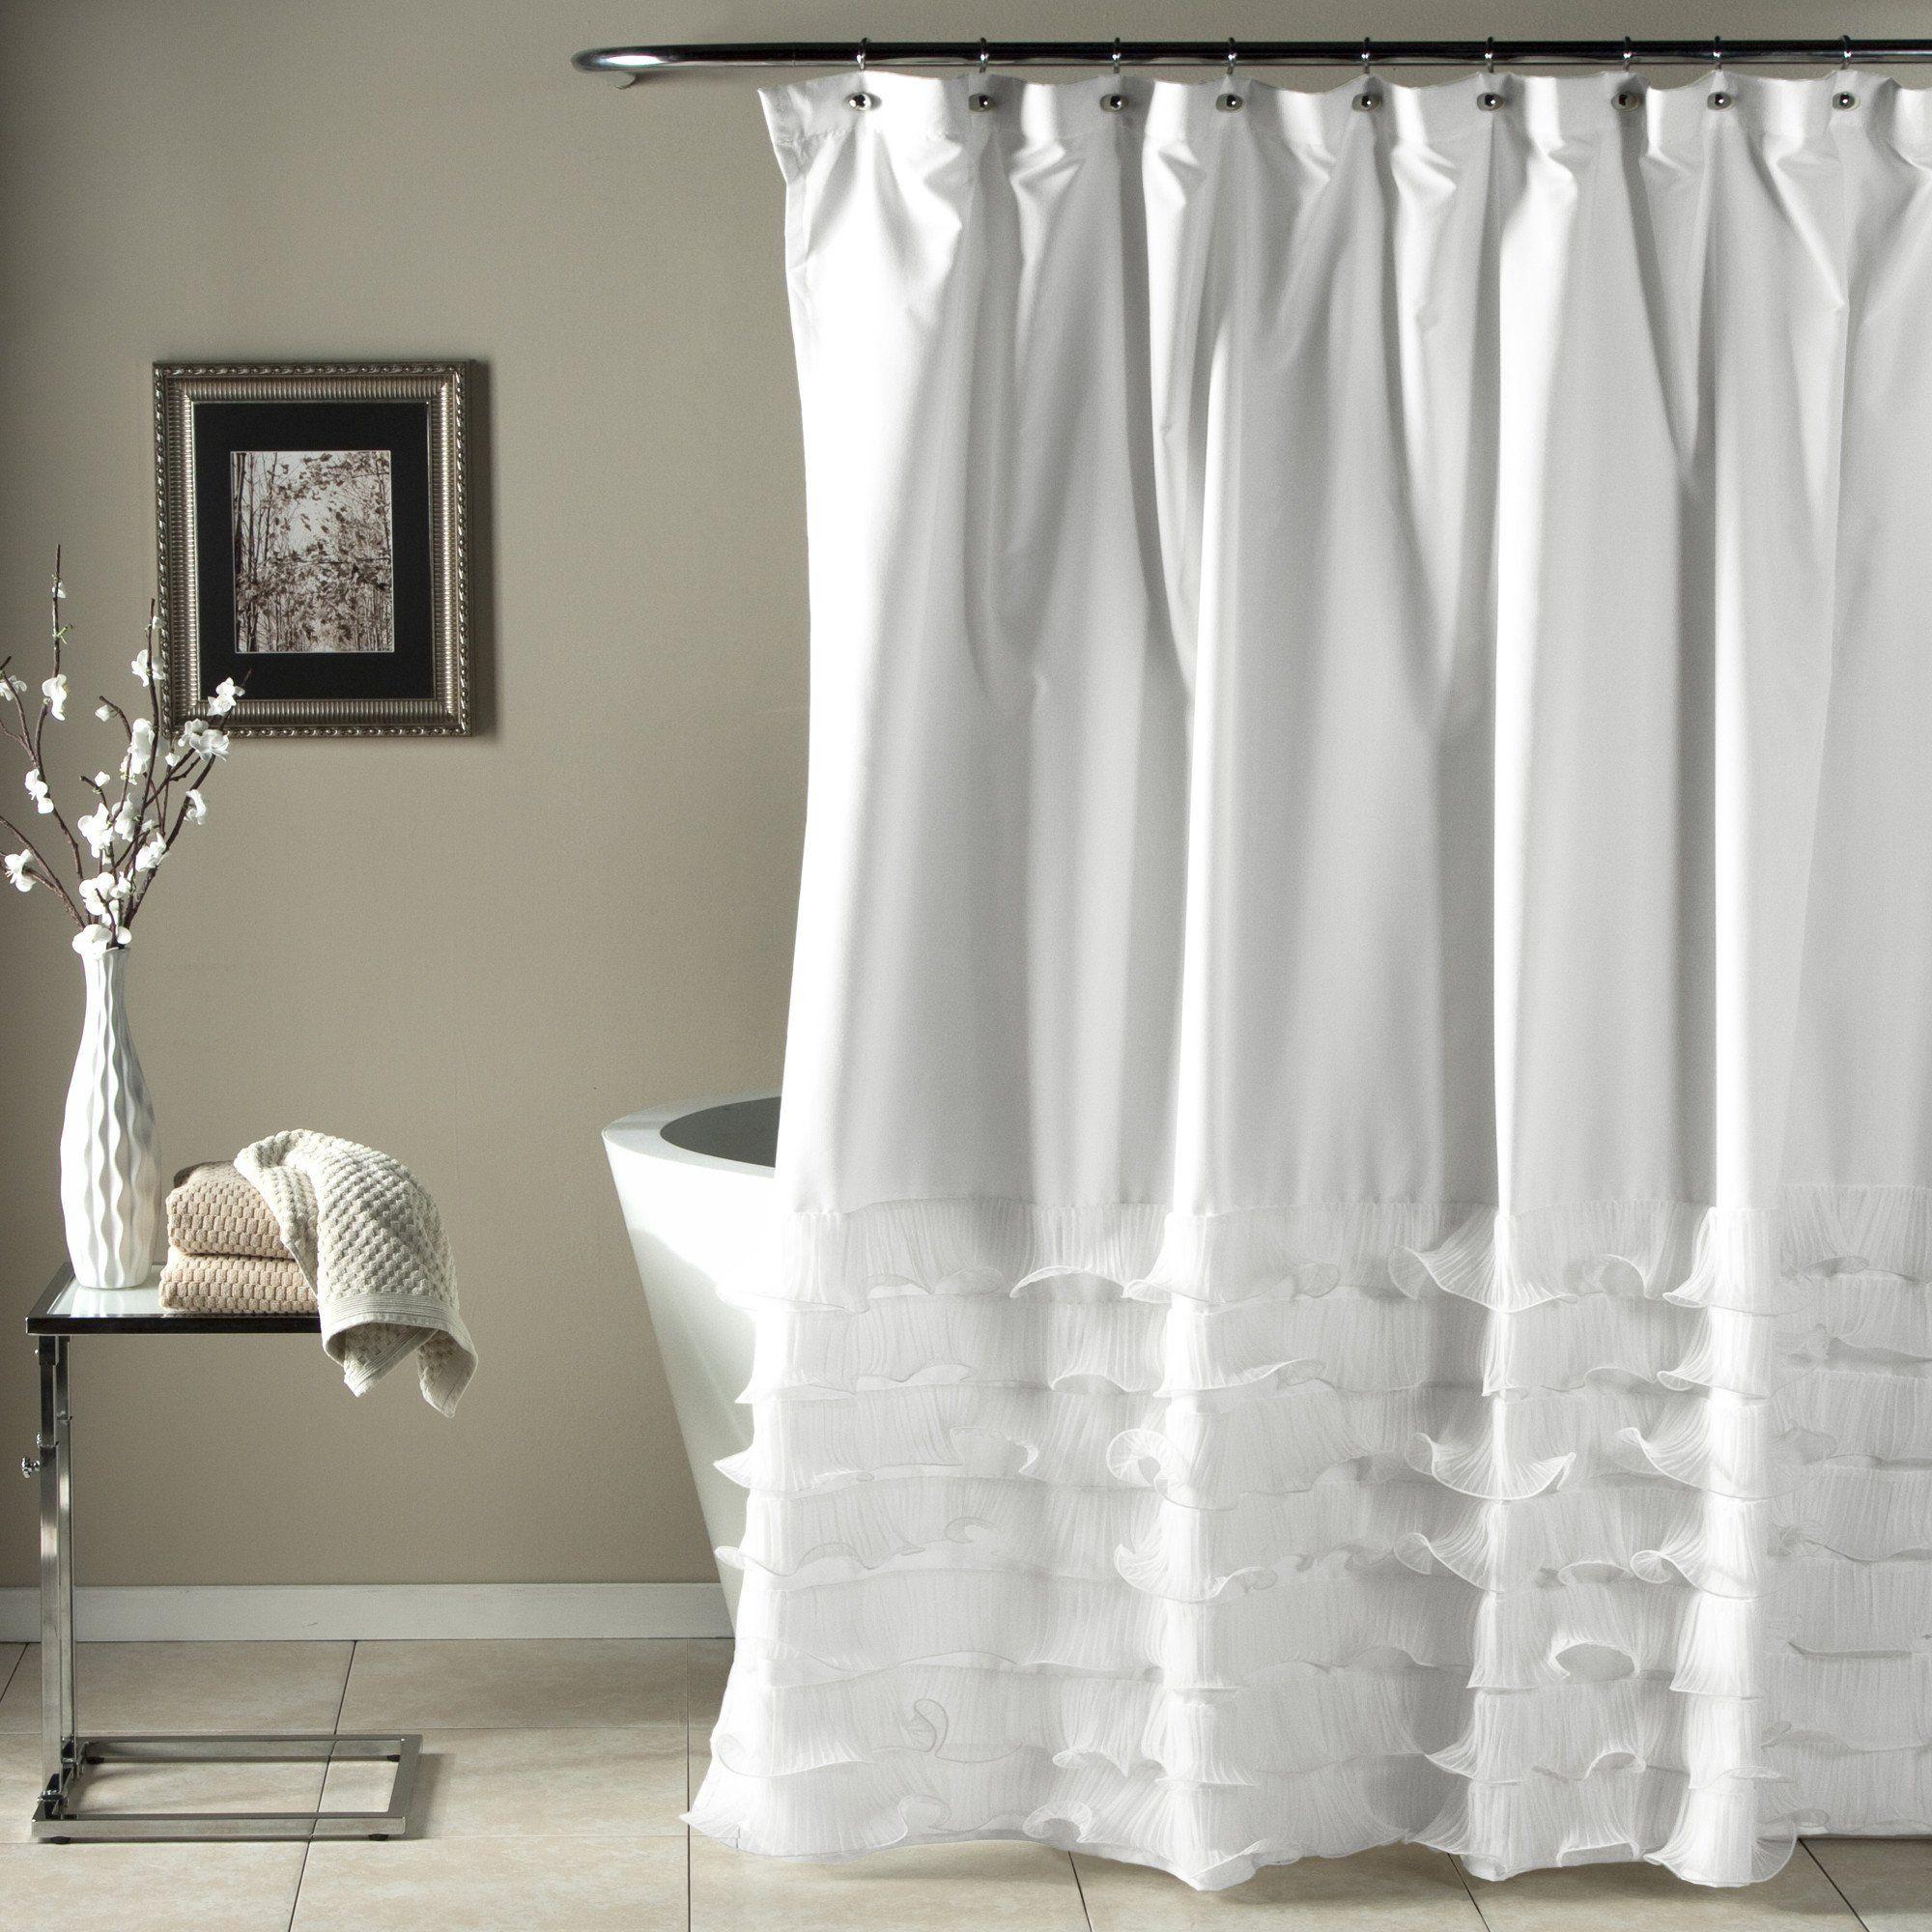 Avery Shower Curtain